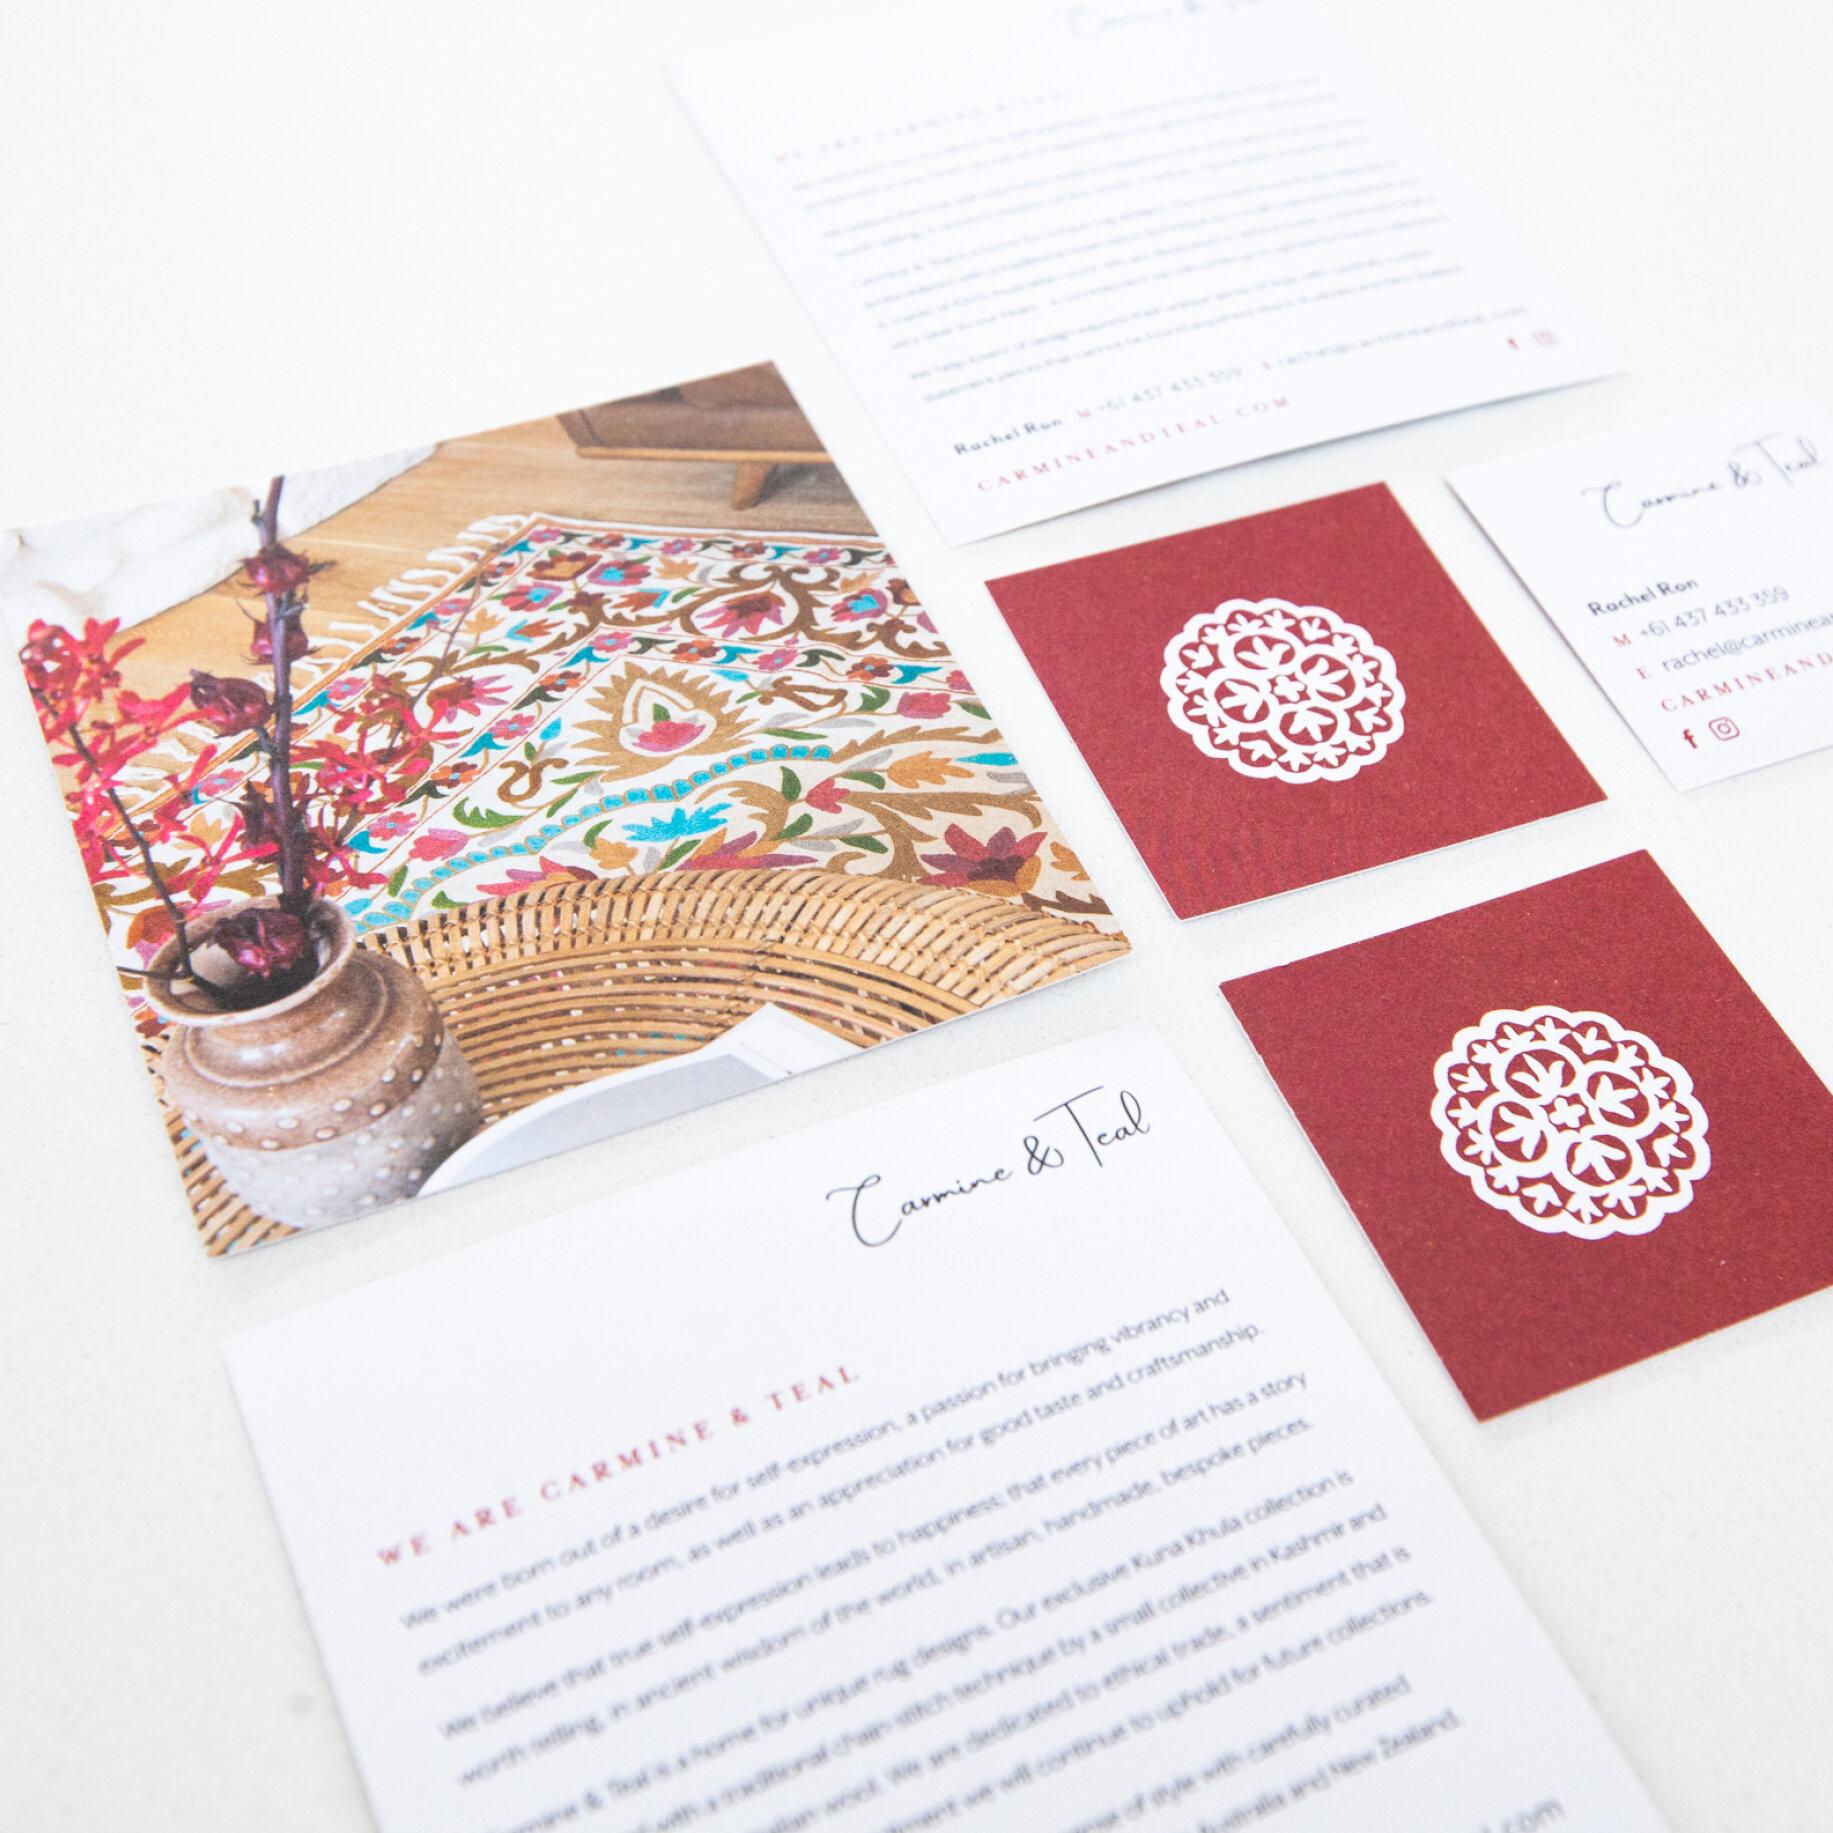 Carmine & Teal Print Design